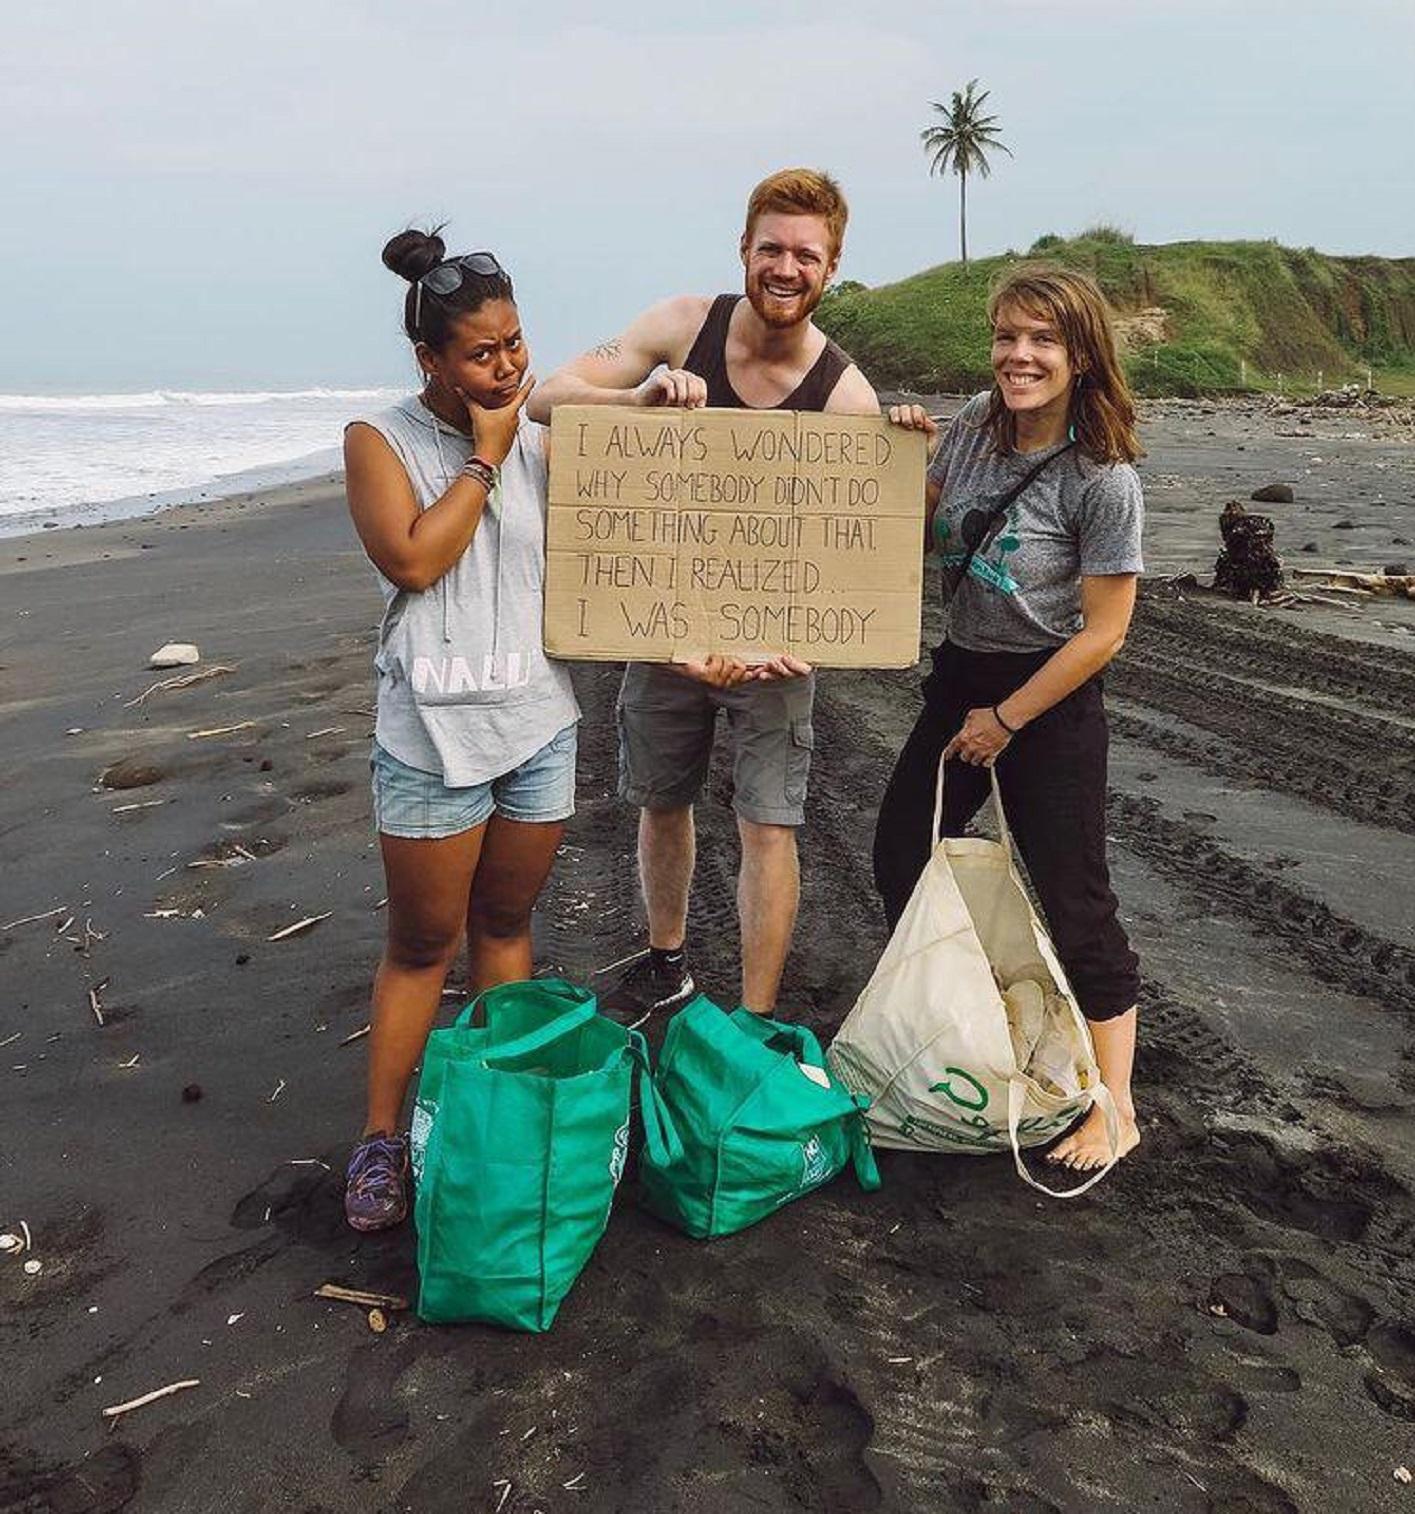 Mermaid's protest on Kuta Beach